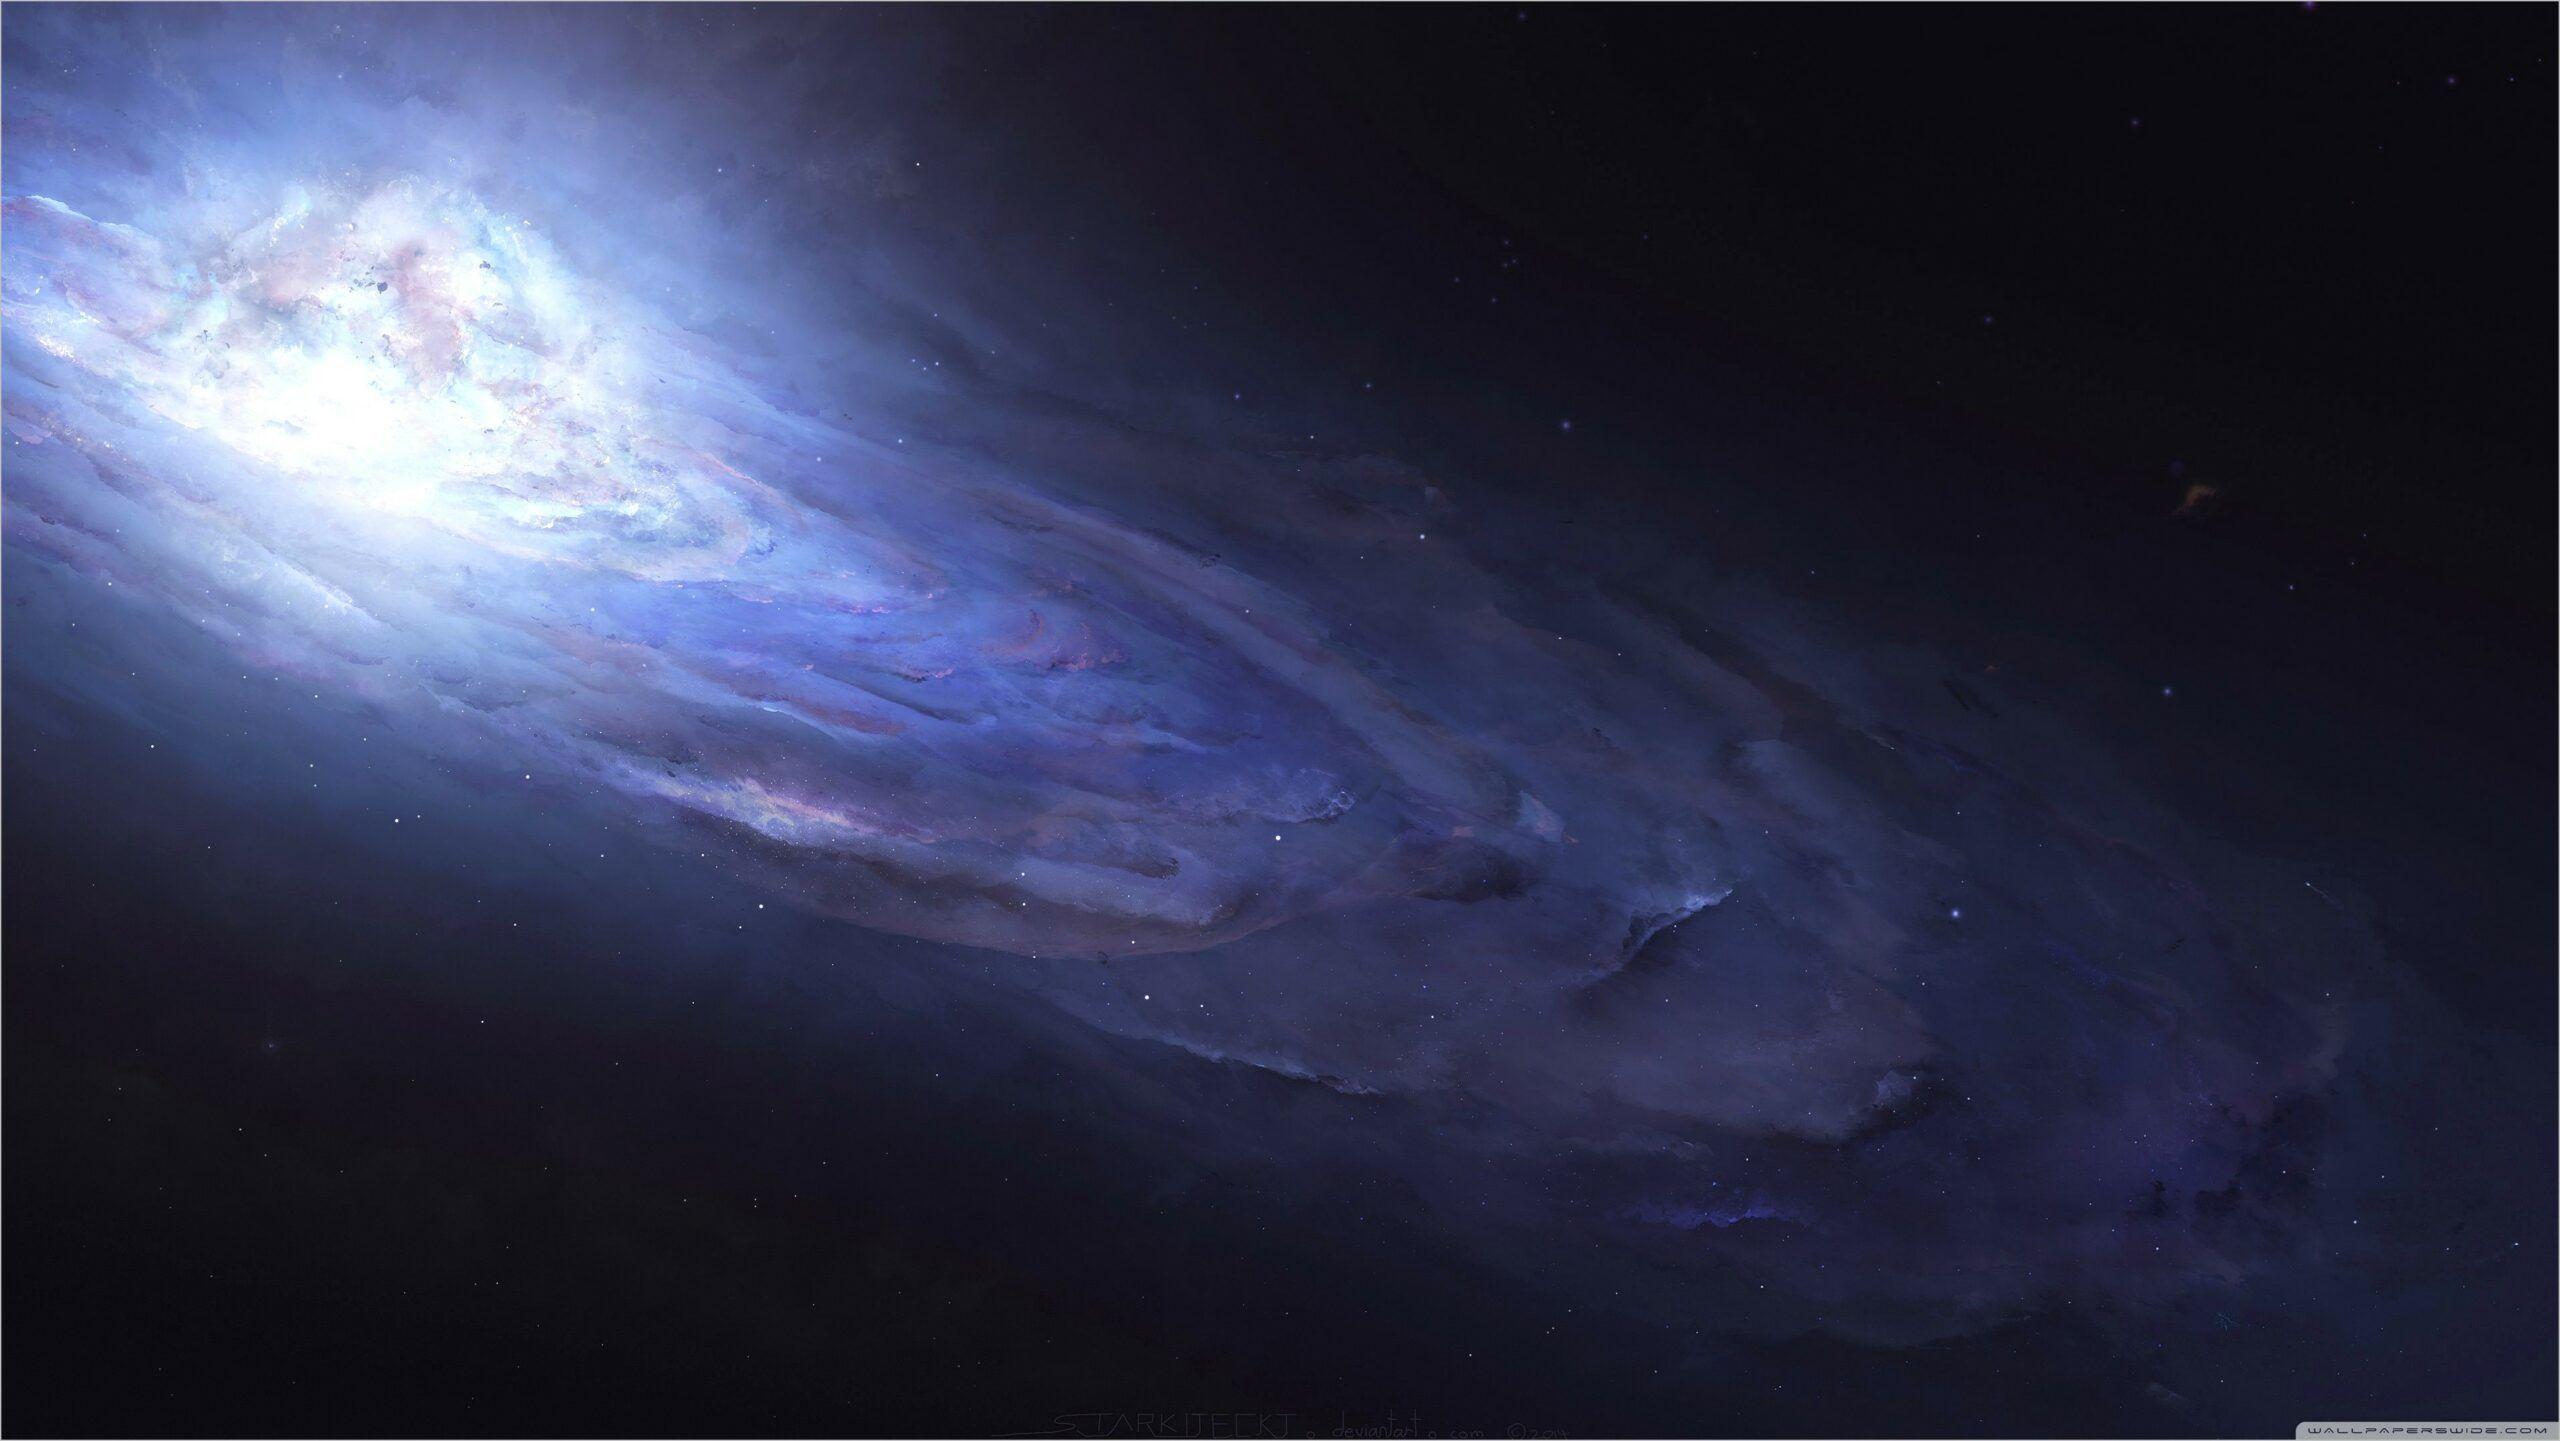 Space Wallpaper 4k Imgur In 2020 Nebula Wallpaper Wallpaper Space Galaxy Wallpaper